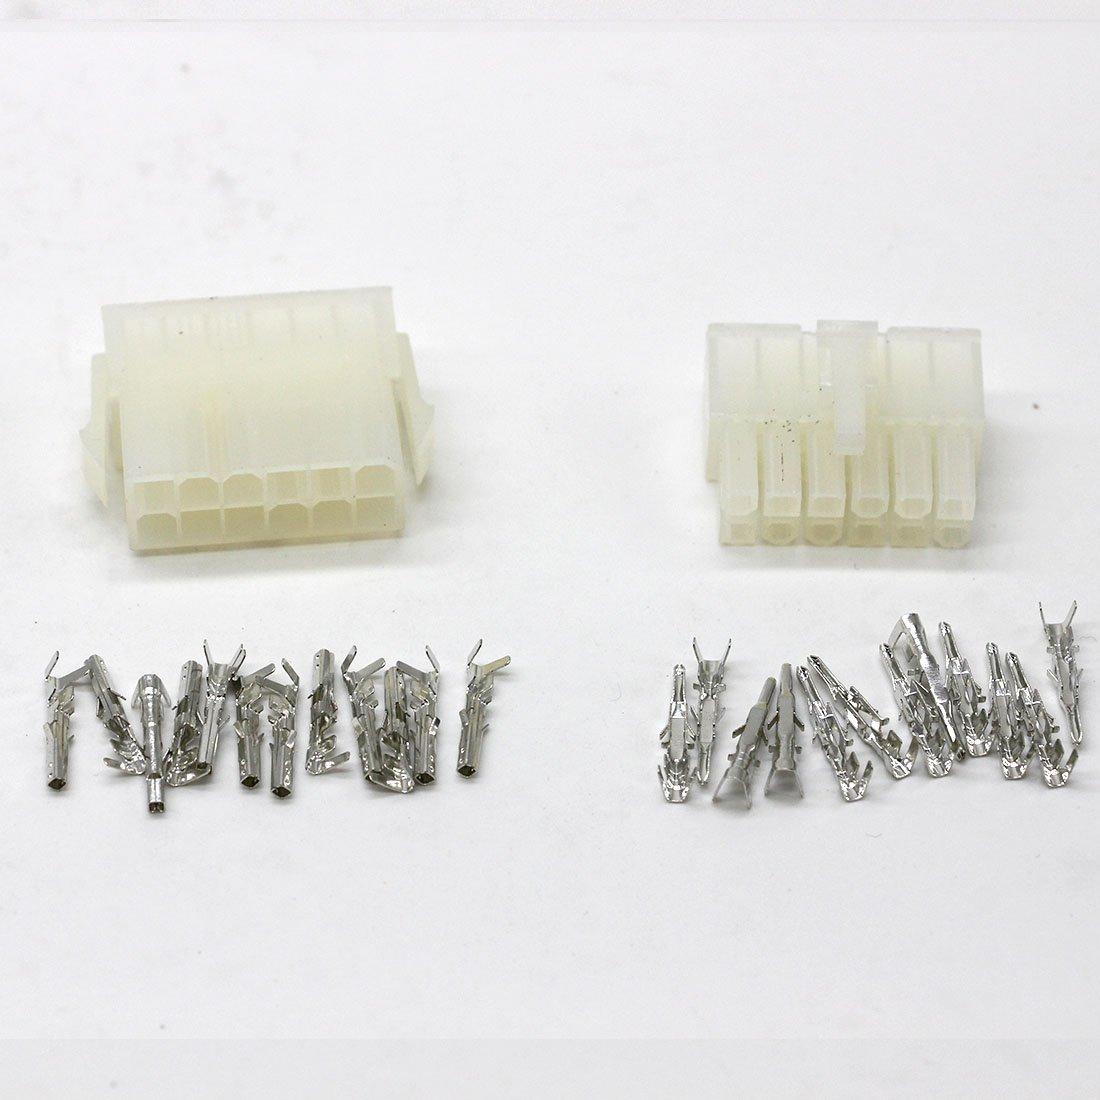 50 sets kit 12p Automobile wire connector plug 5557 5566 plastic terminal plug spring terminals computer